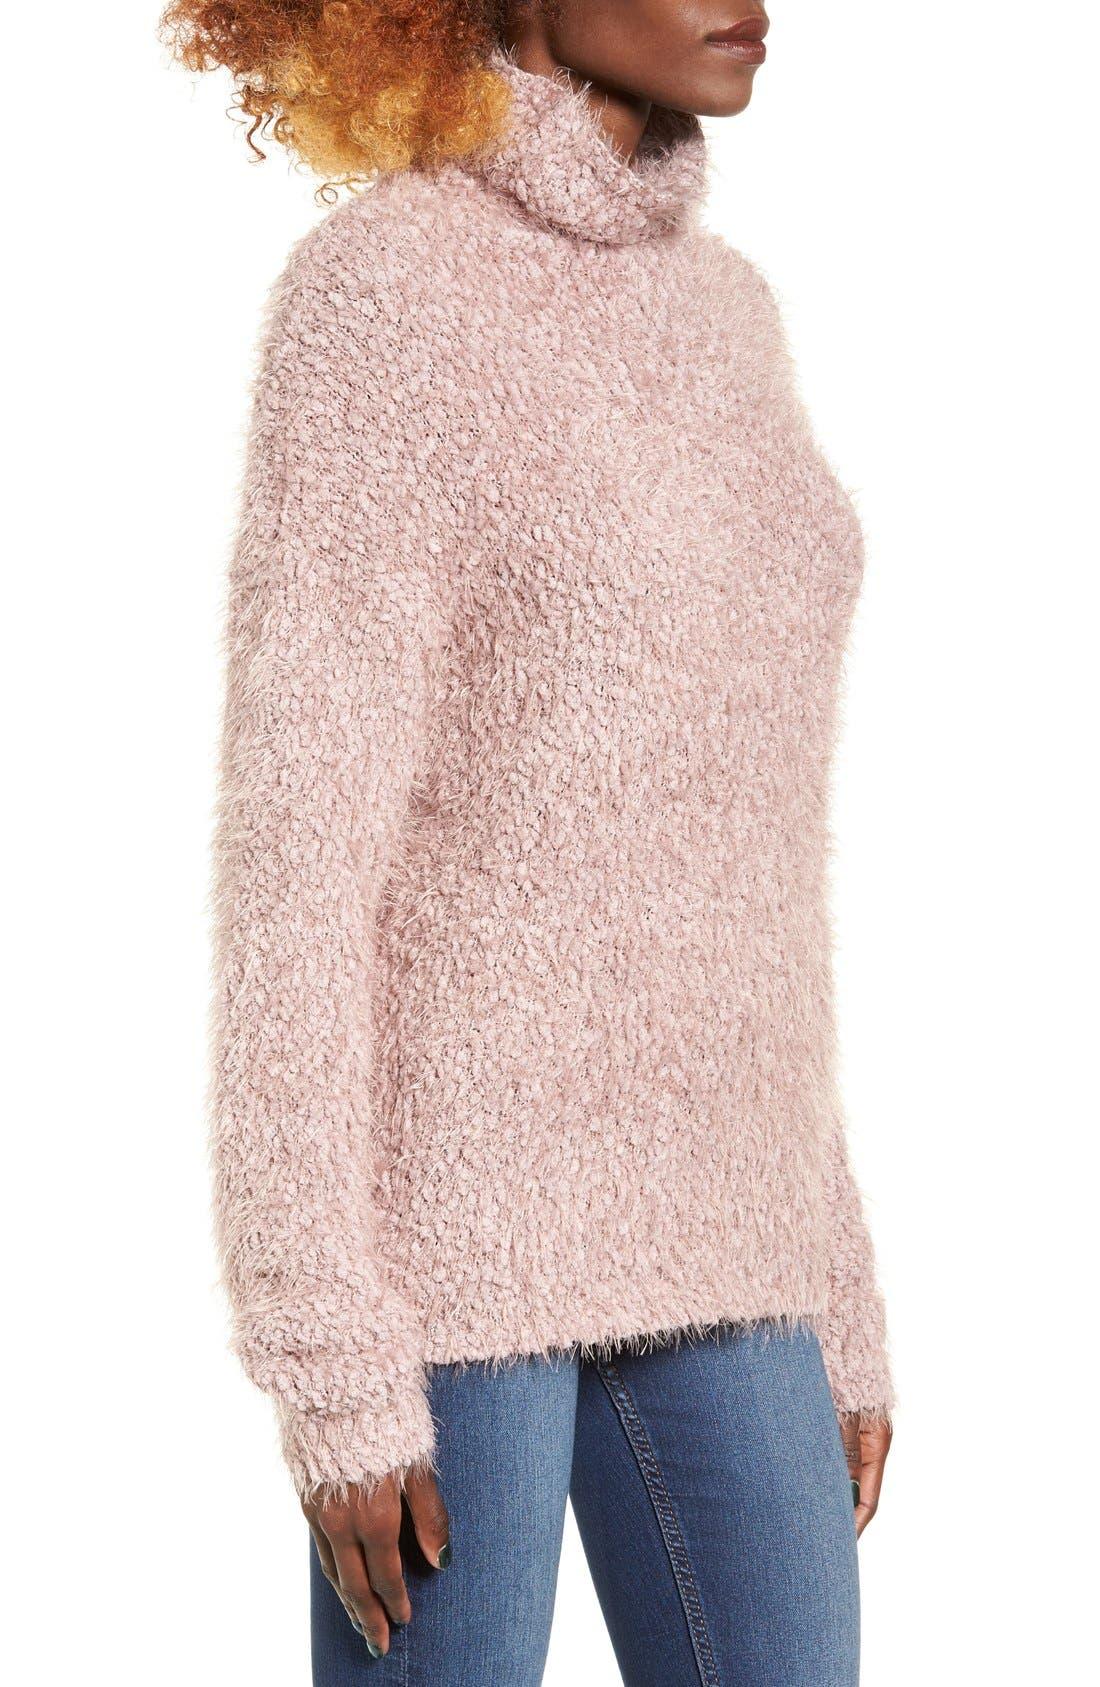 Alternate Image 3  - BP. Fluffy Knit Mock Neck Pullover